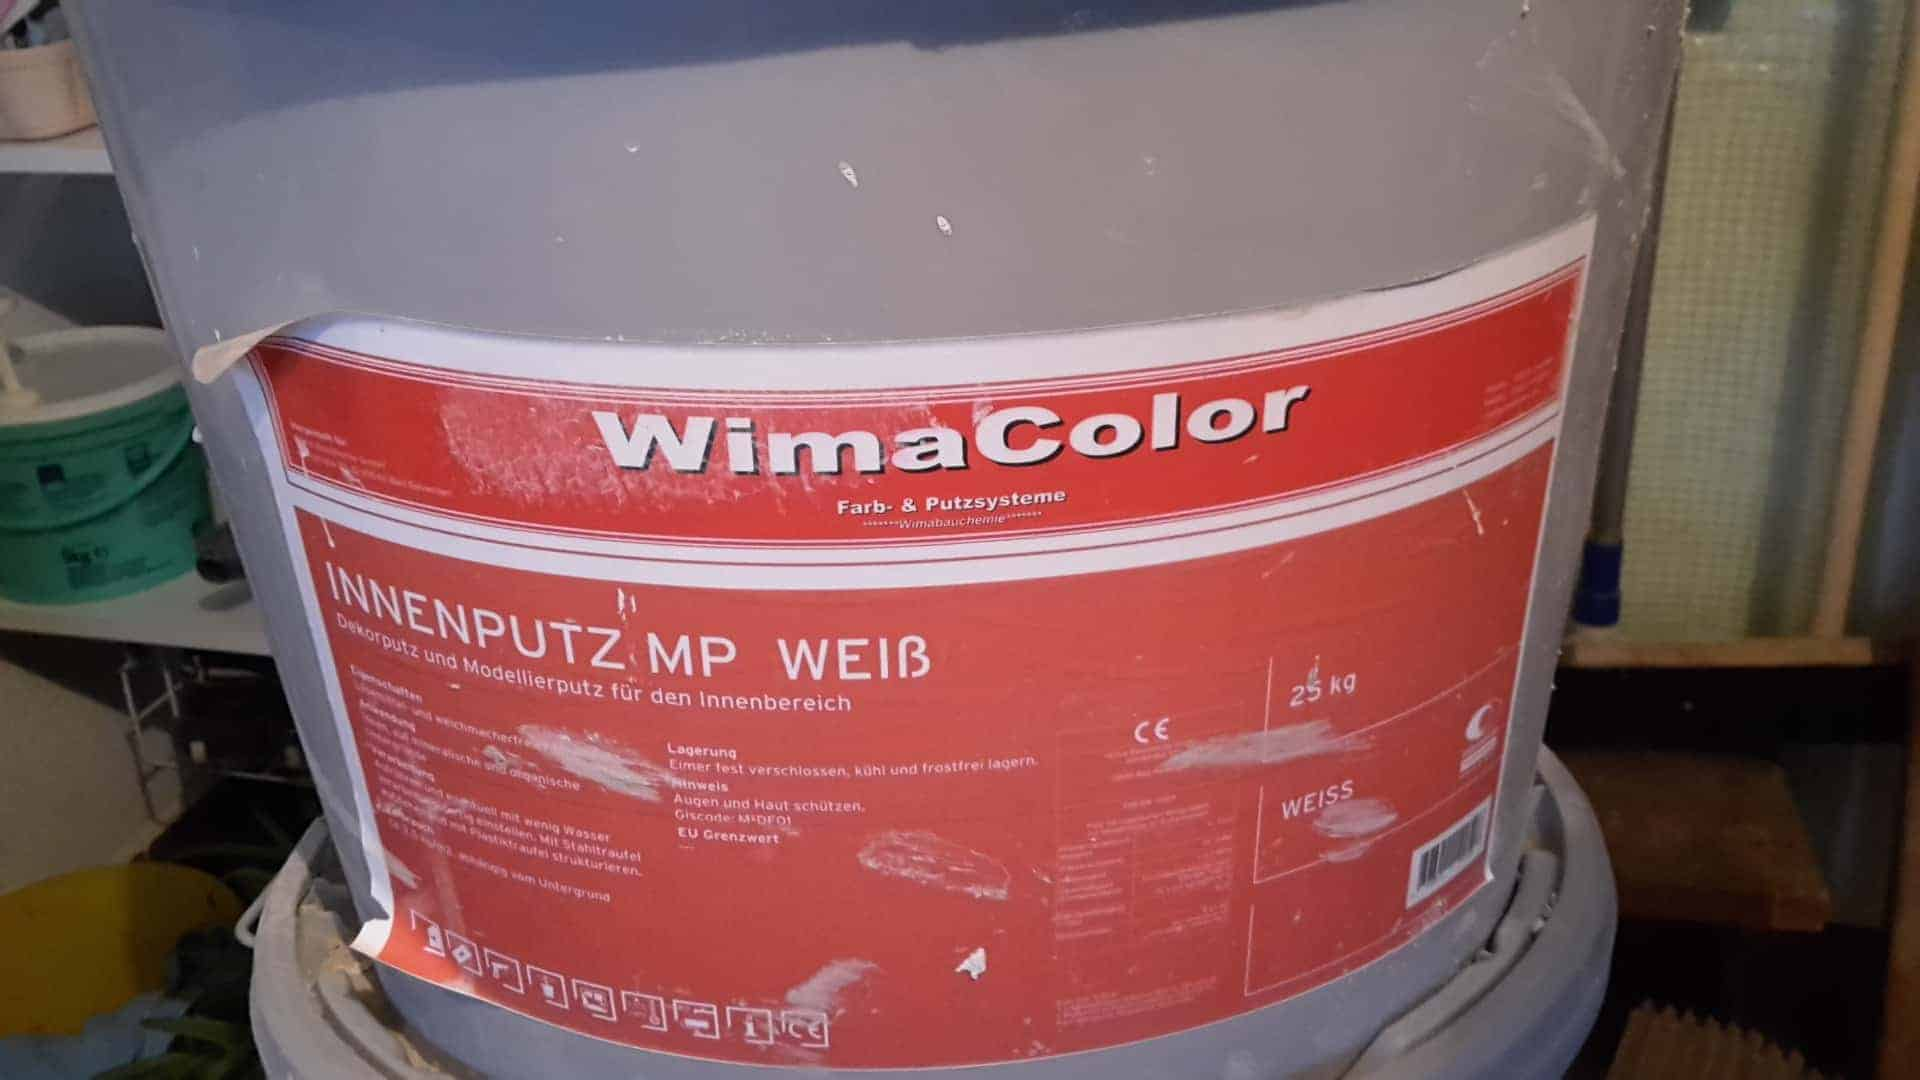 Wima color innenputz MP weiß